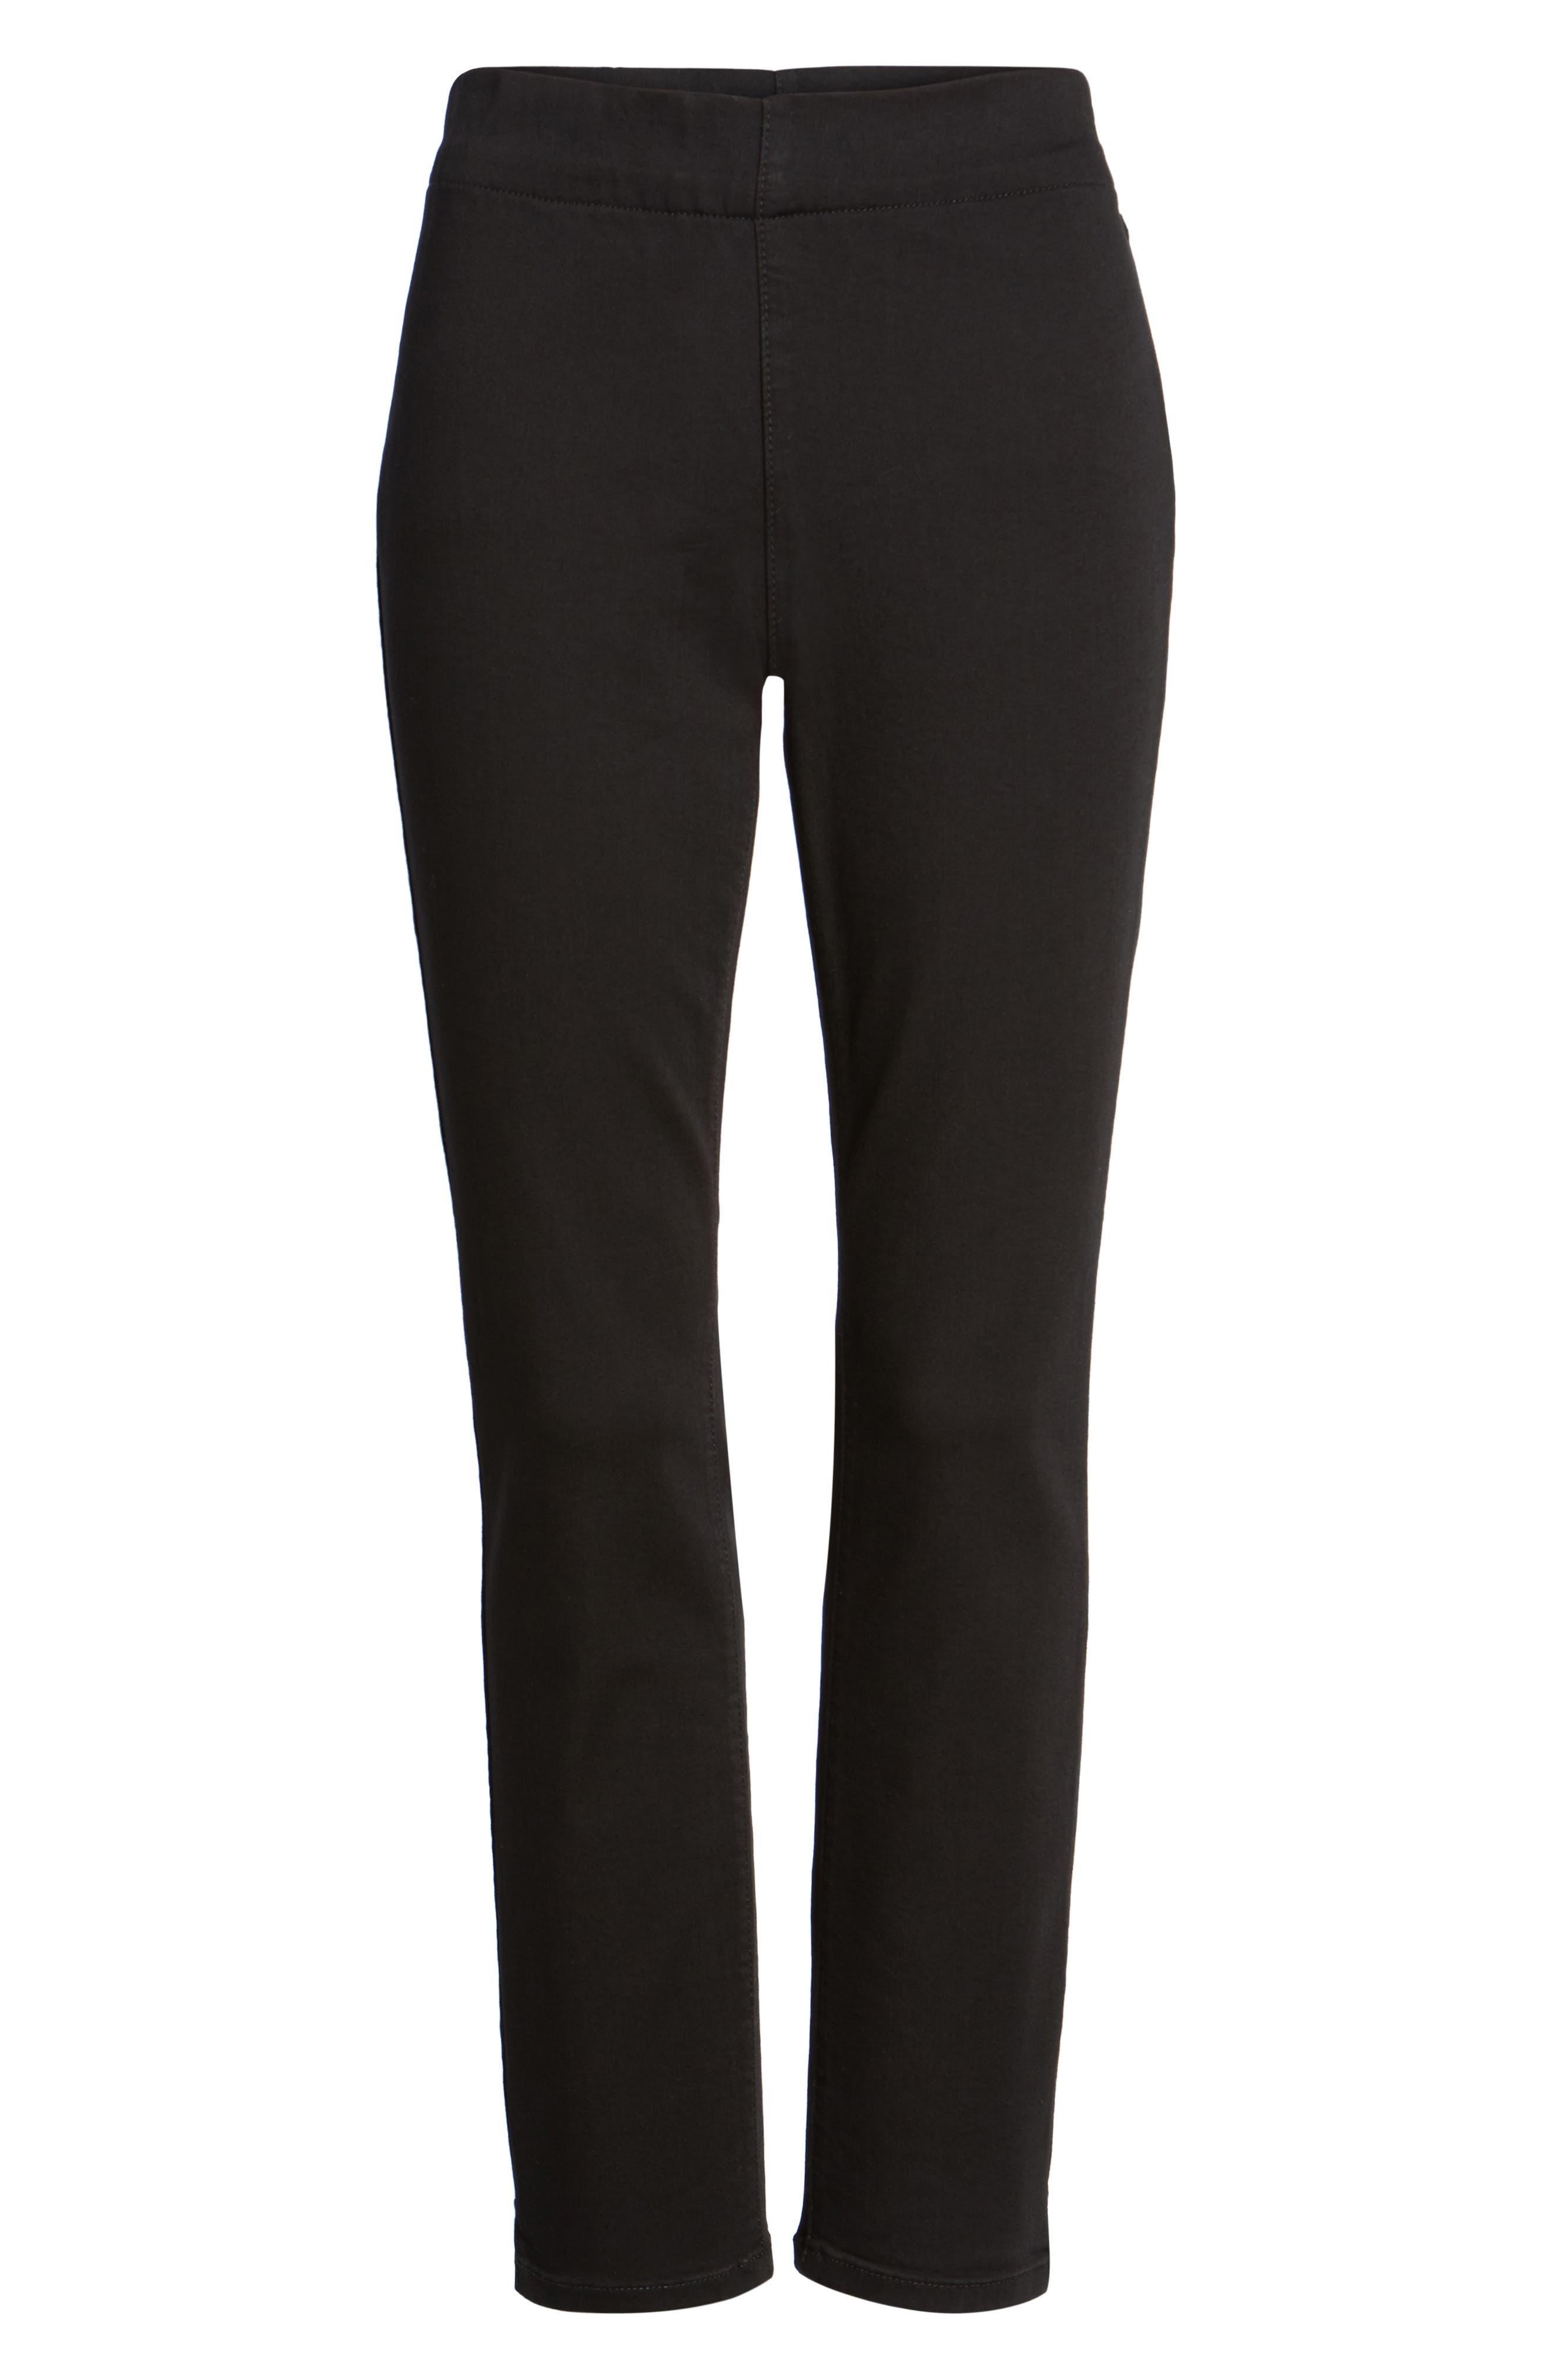 Alina Stretch Ankle Jeans,                             Alternate thumbnail 4, color,                             Black